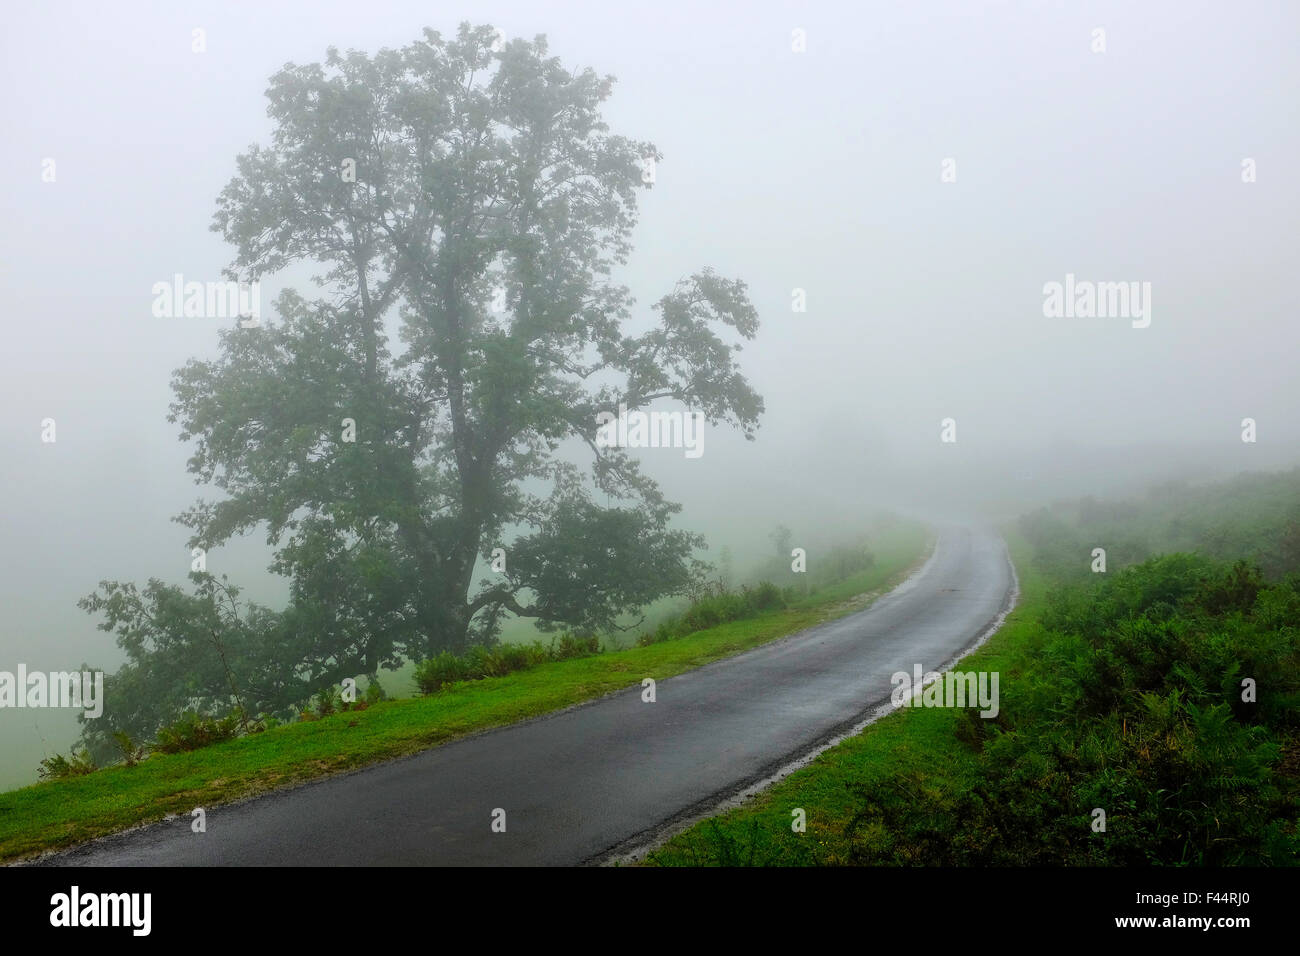 Mist on the Napoleon Route to Roncesvalles, Way of Saint James (Camino de Santiago), France. - Stock Image